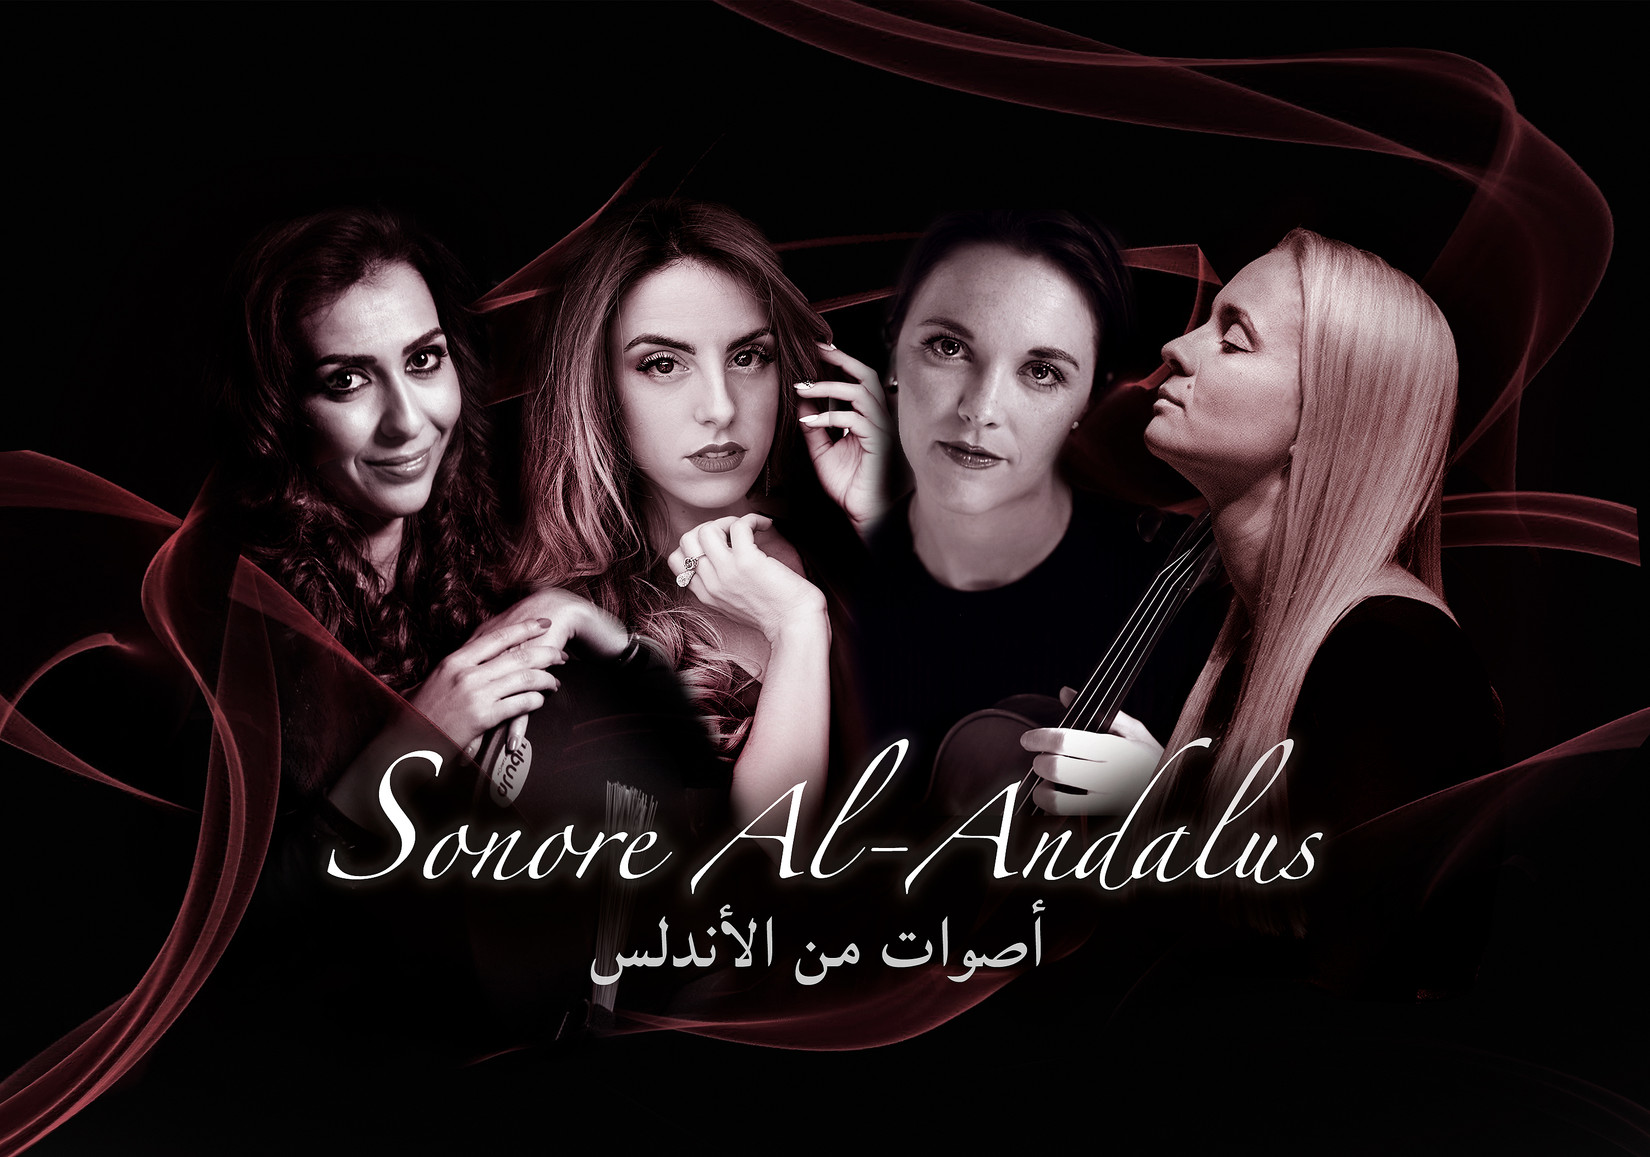 Sonore Al-Andalus